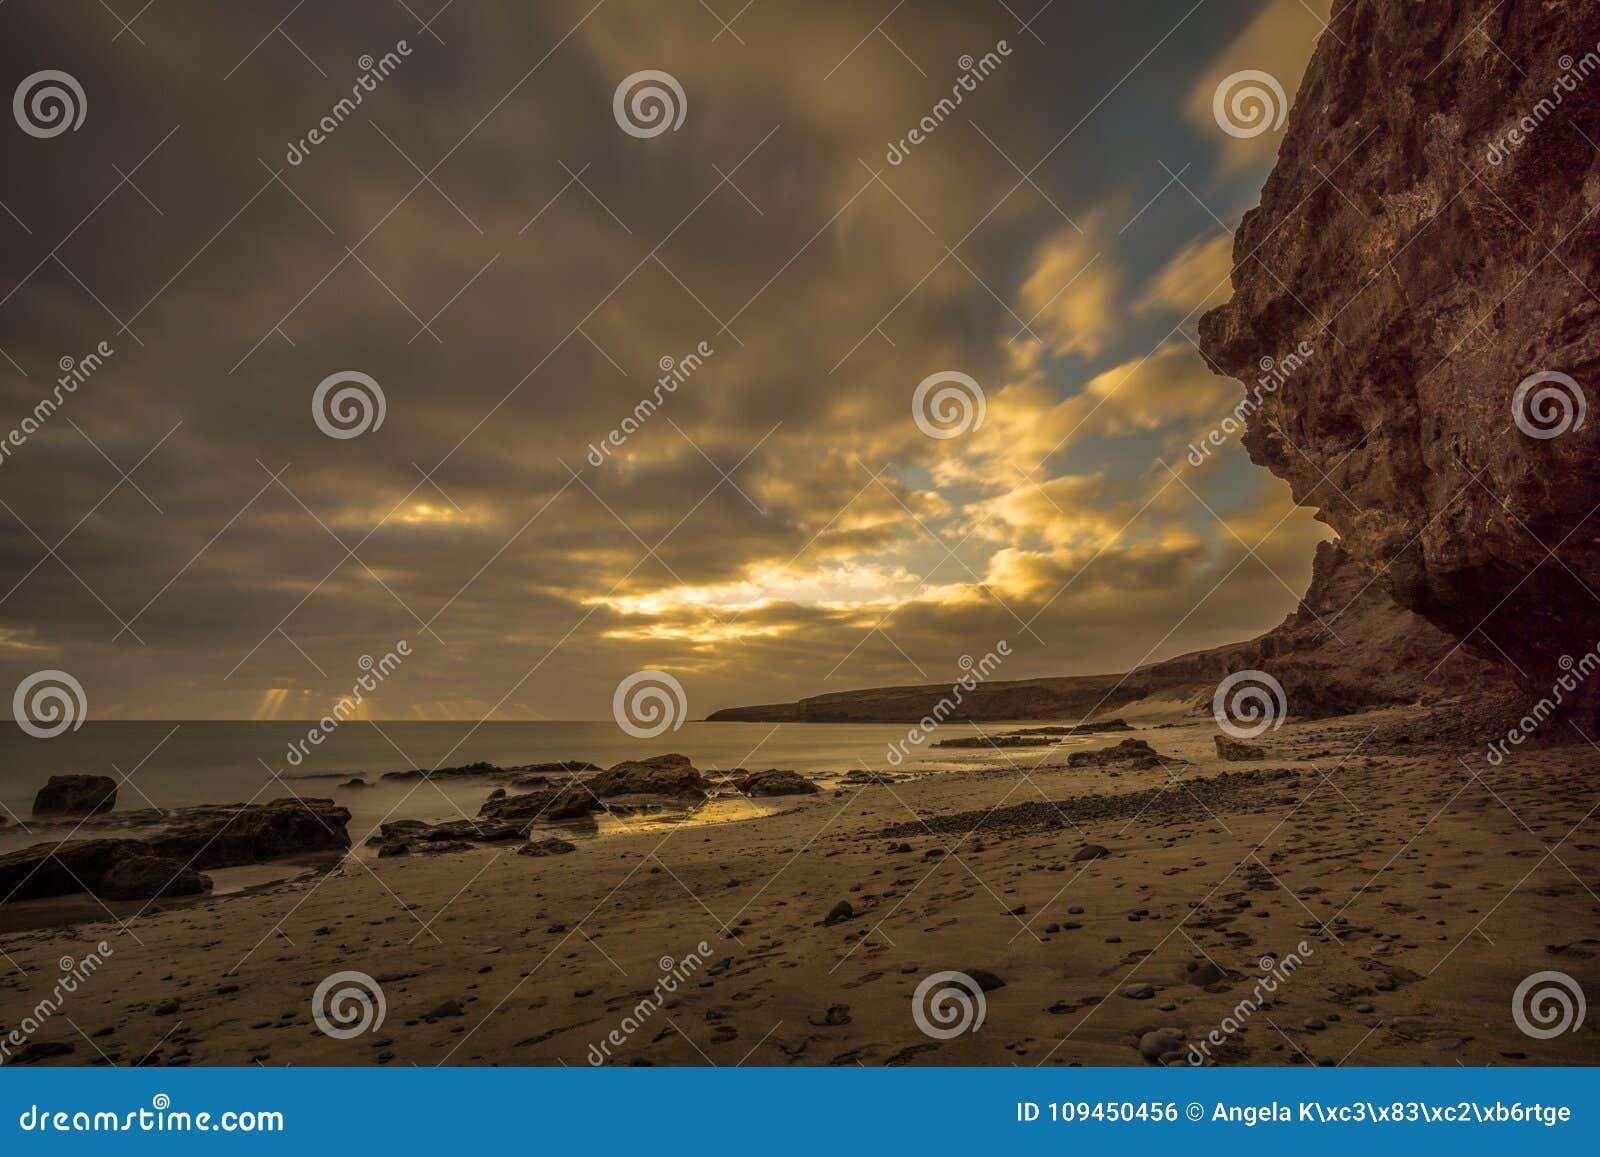 Пристаньте к берегу на канарском острове с темными облаками